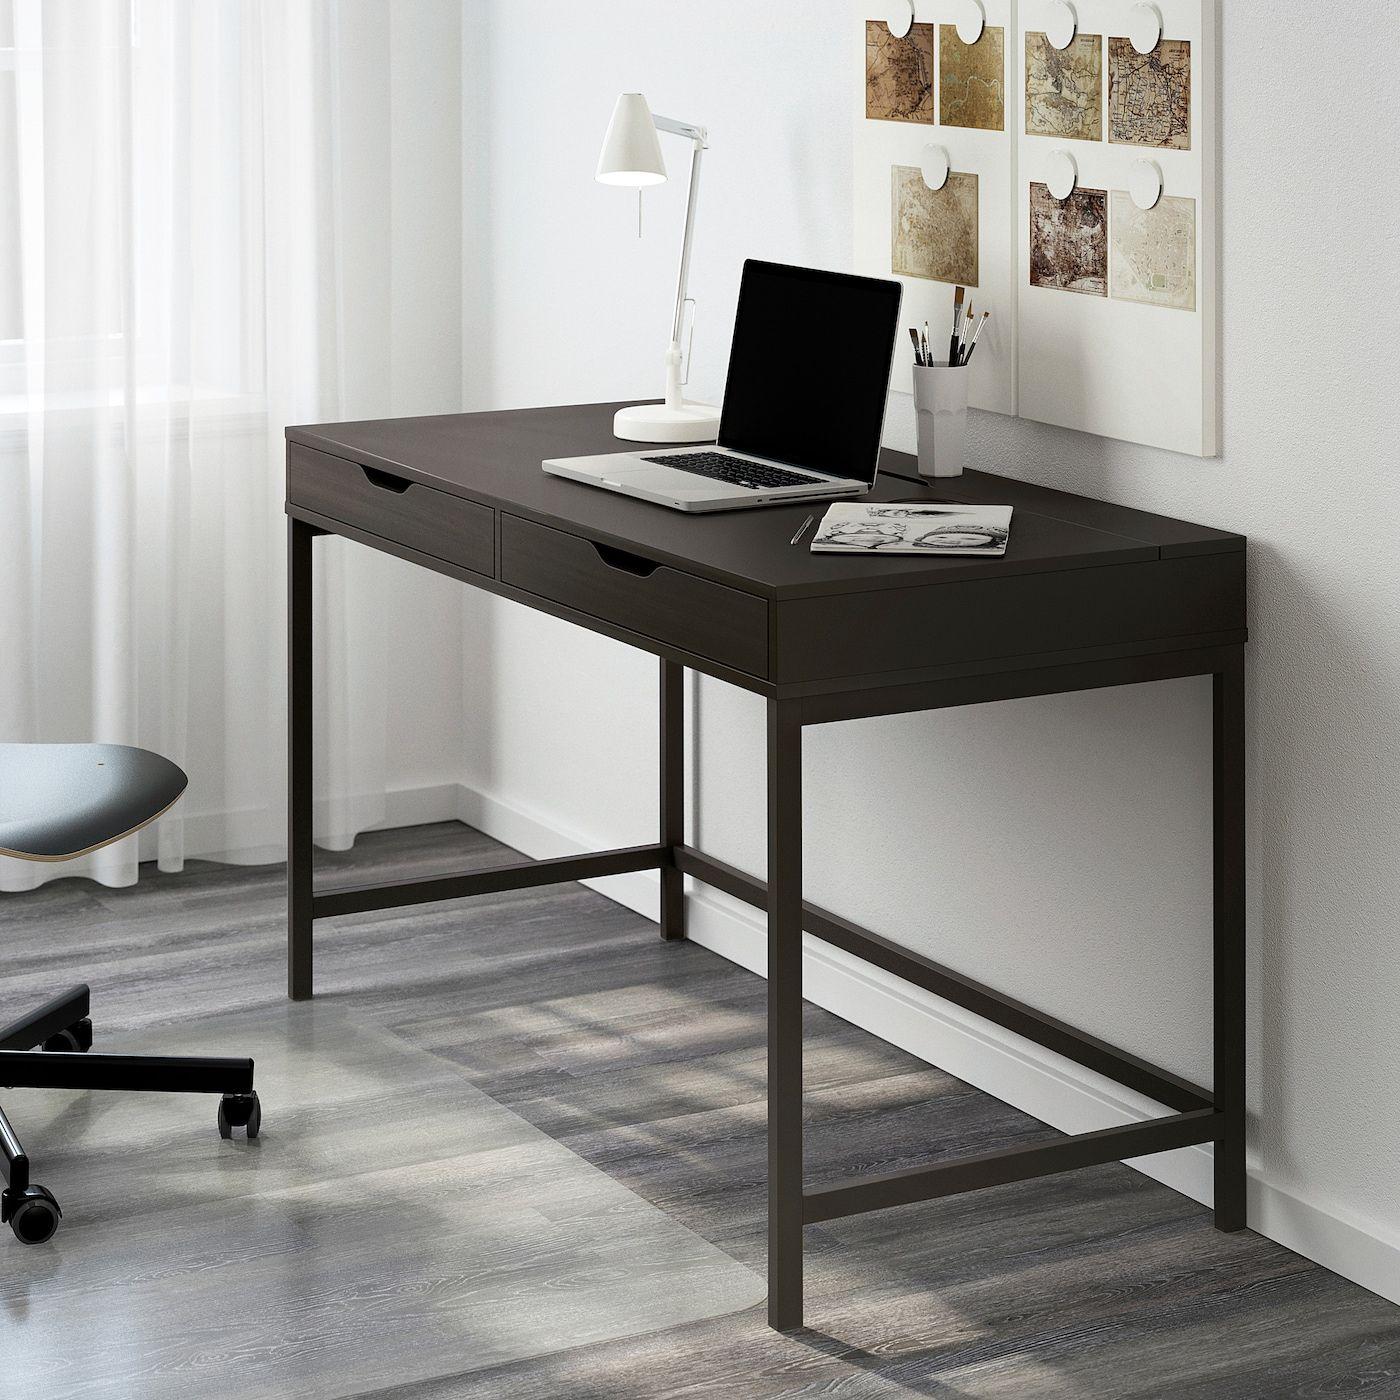 "ALEX Desk, blackbrown, 51 5/8x23 5/8"" IKEA Alex desk"